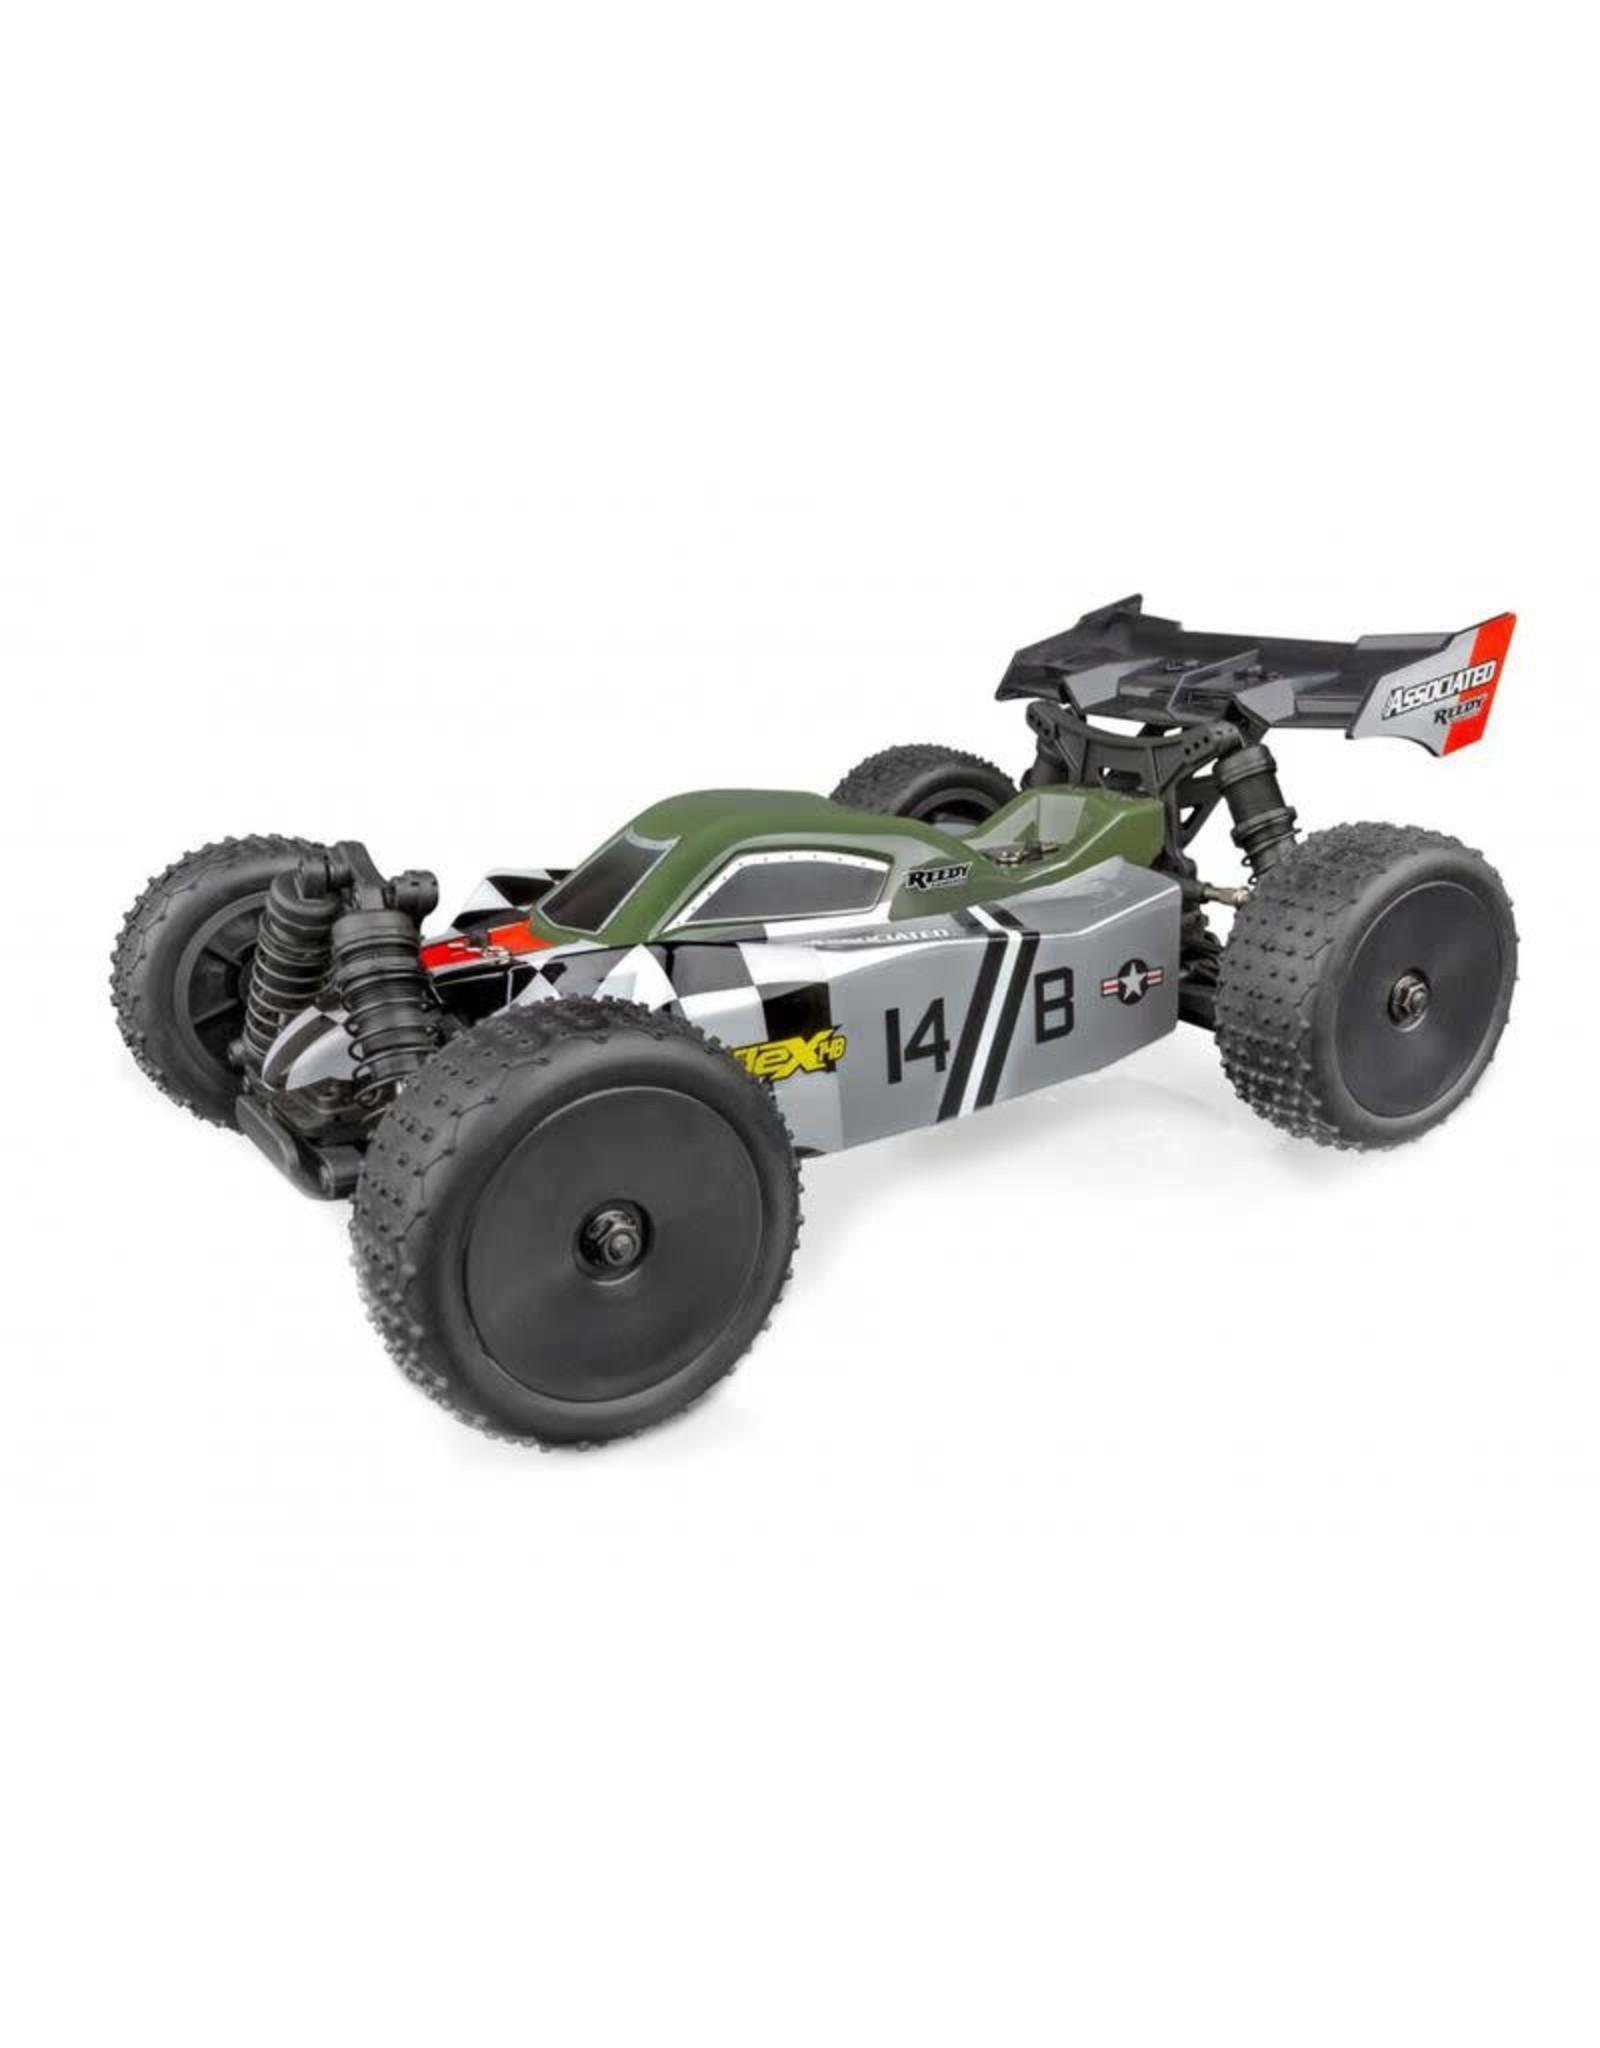 Team Associated 1/14 Reflex 14B 4WD Brushless Buggy RTR